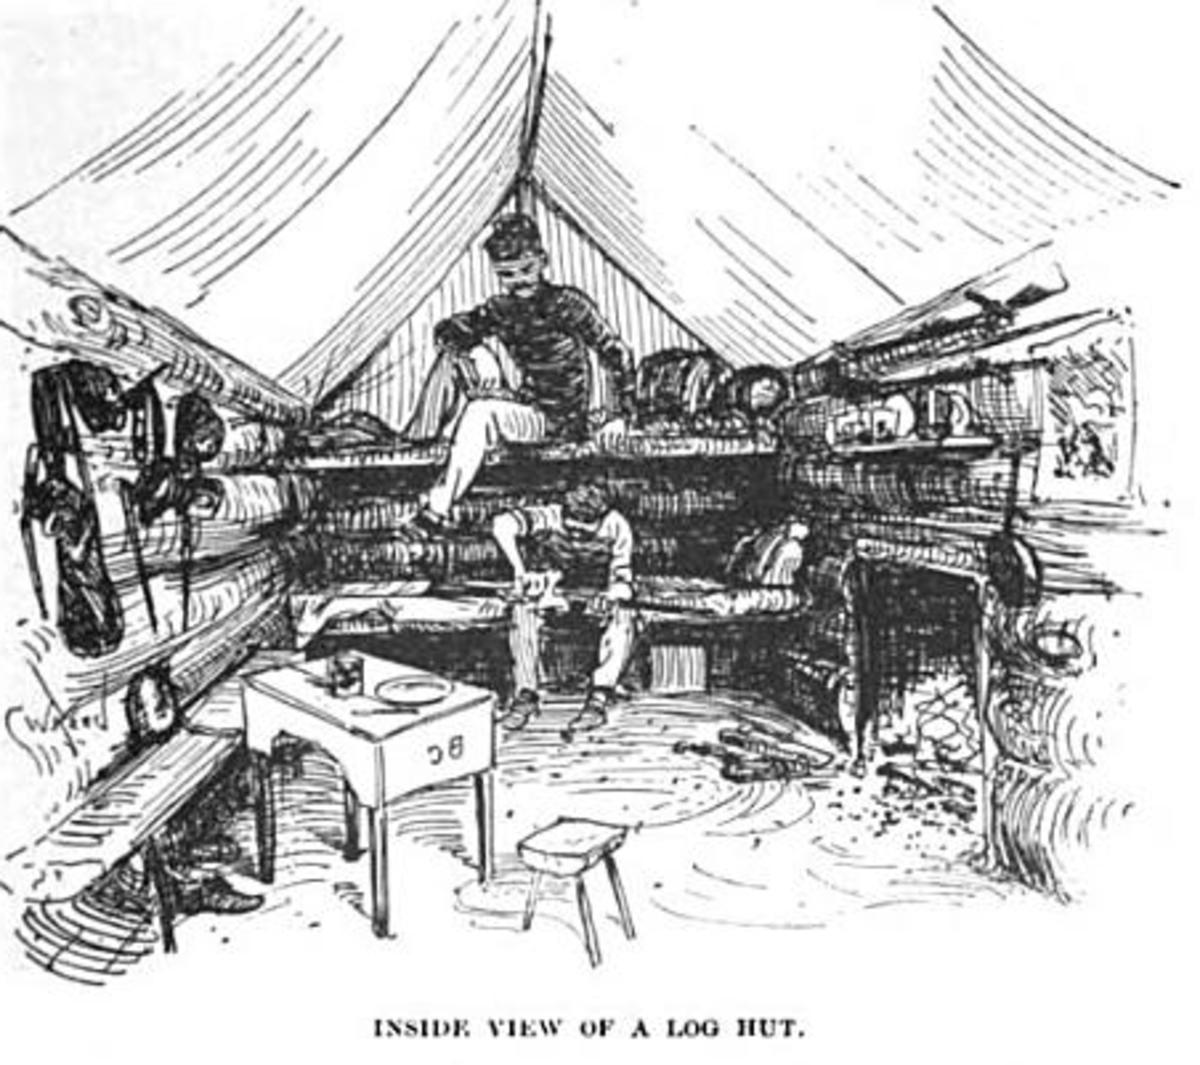 Illustration of an interior of a log hut